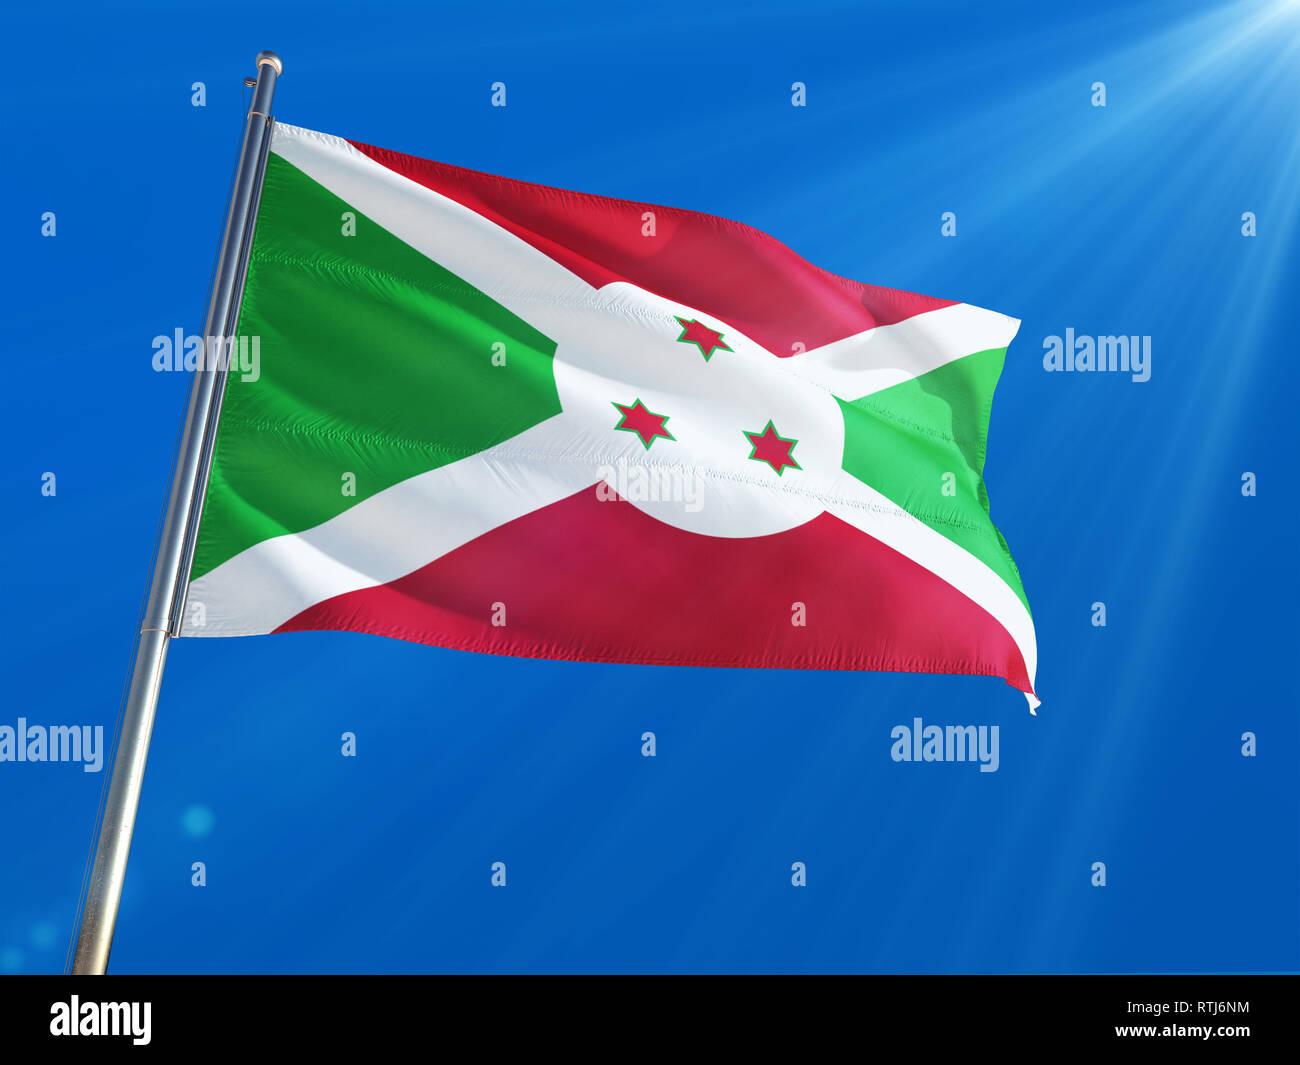 Burundi National Flag Waving on pole against deep blue sky background. High Definition Stock Photo